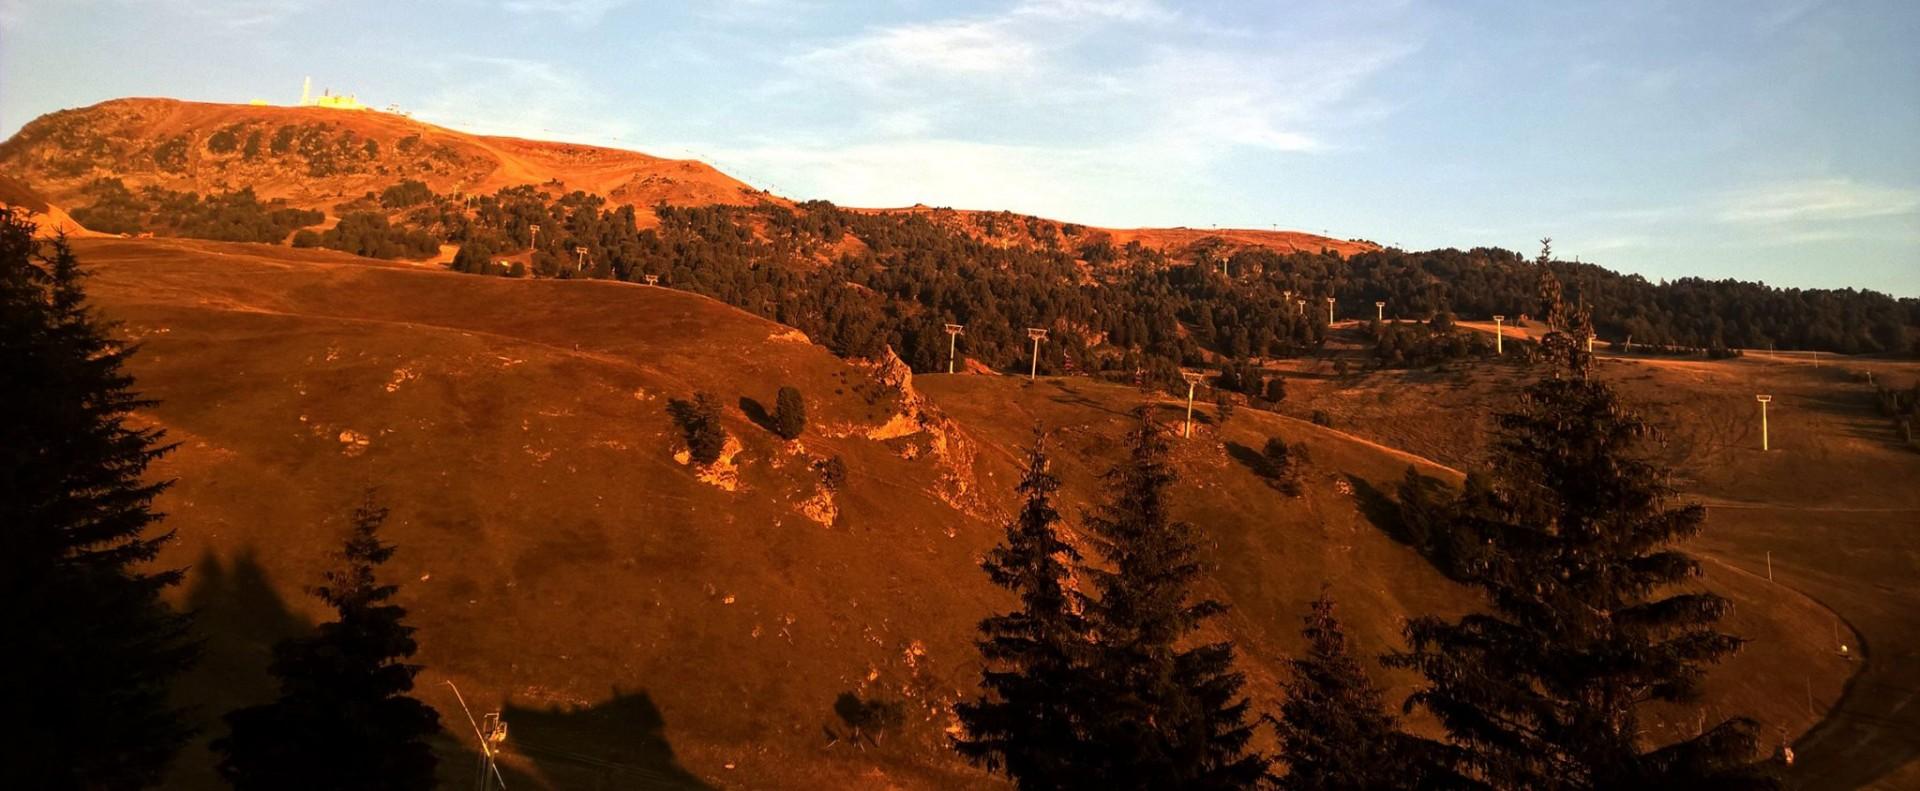 Name Cham-rousse chamrousse ski resort isere french alps